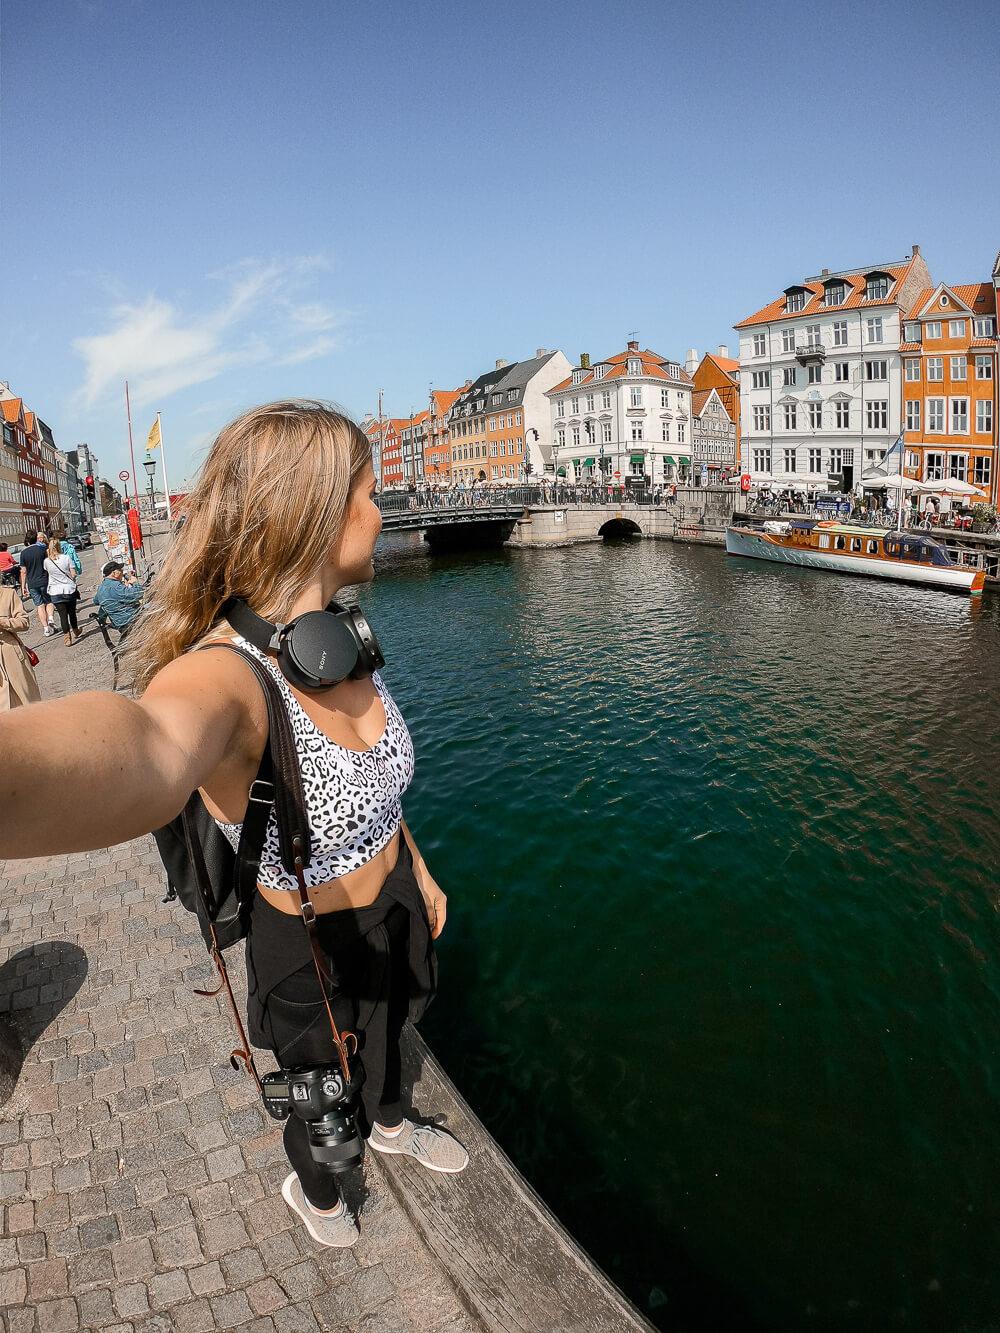 SIX CITIES IN SEVEN DAYS: STOCKHOLM, COPENHAGEN AND OSLO